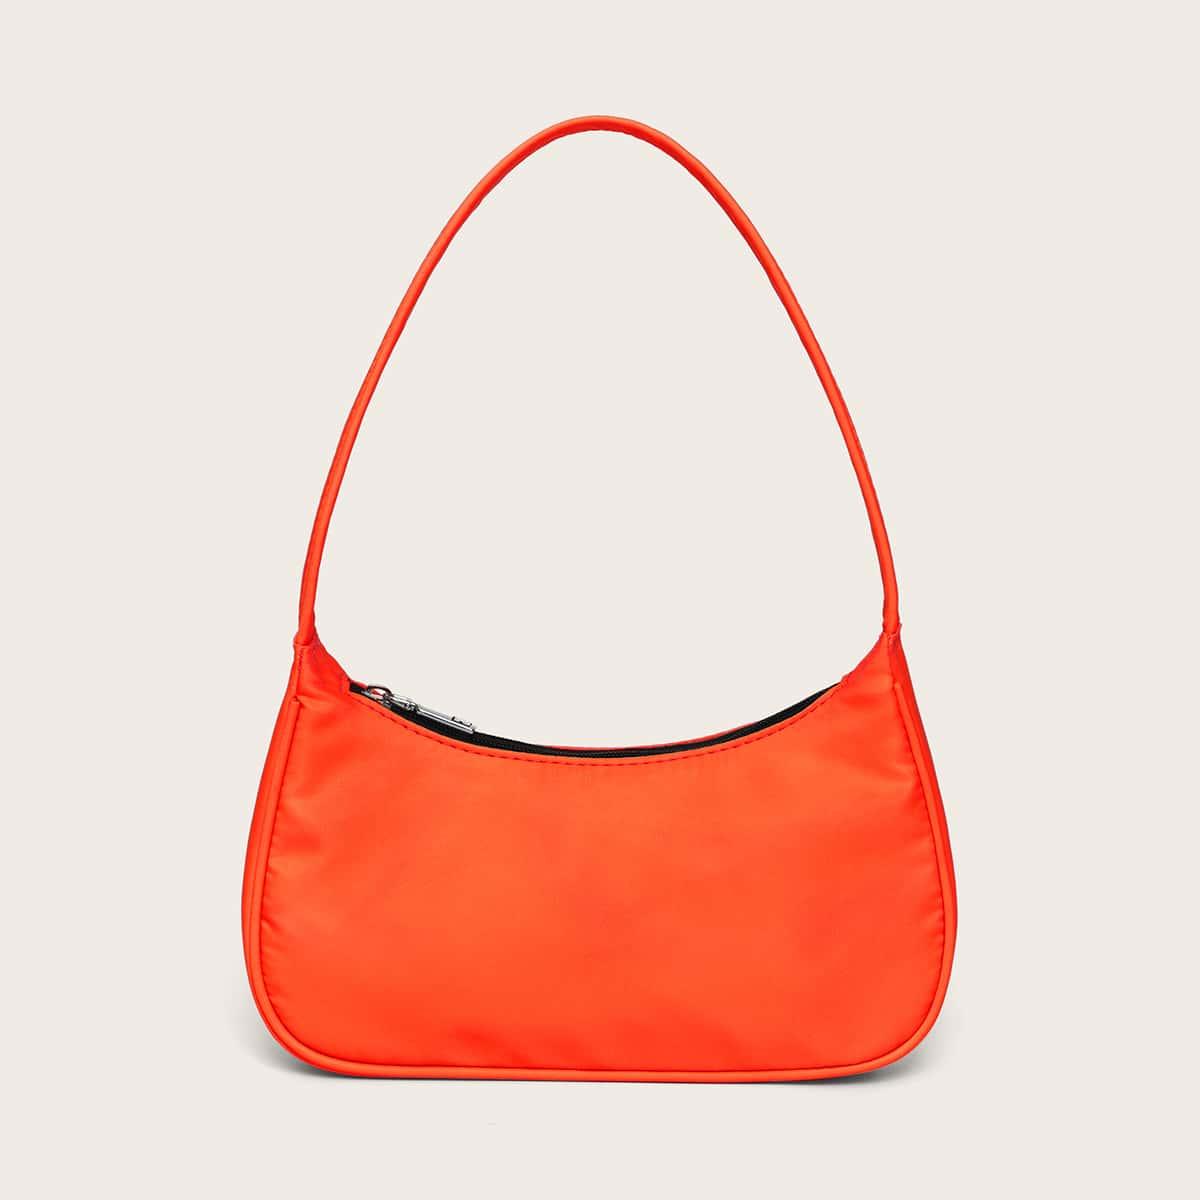 Неоновая оранжевая сумка-багет